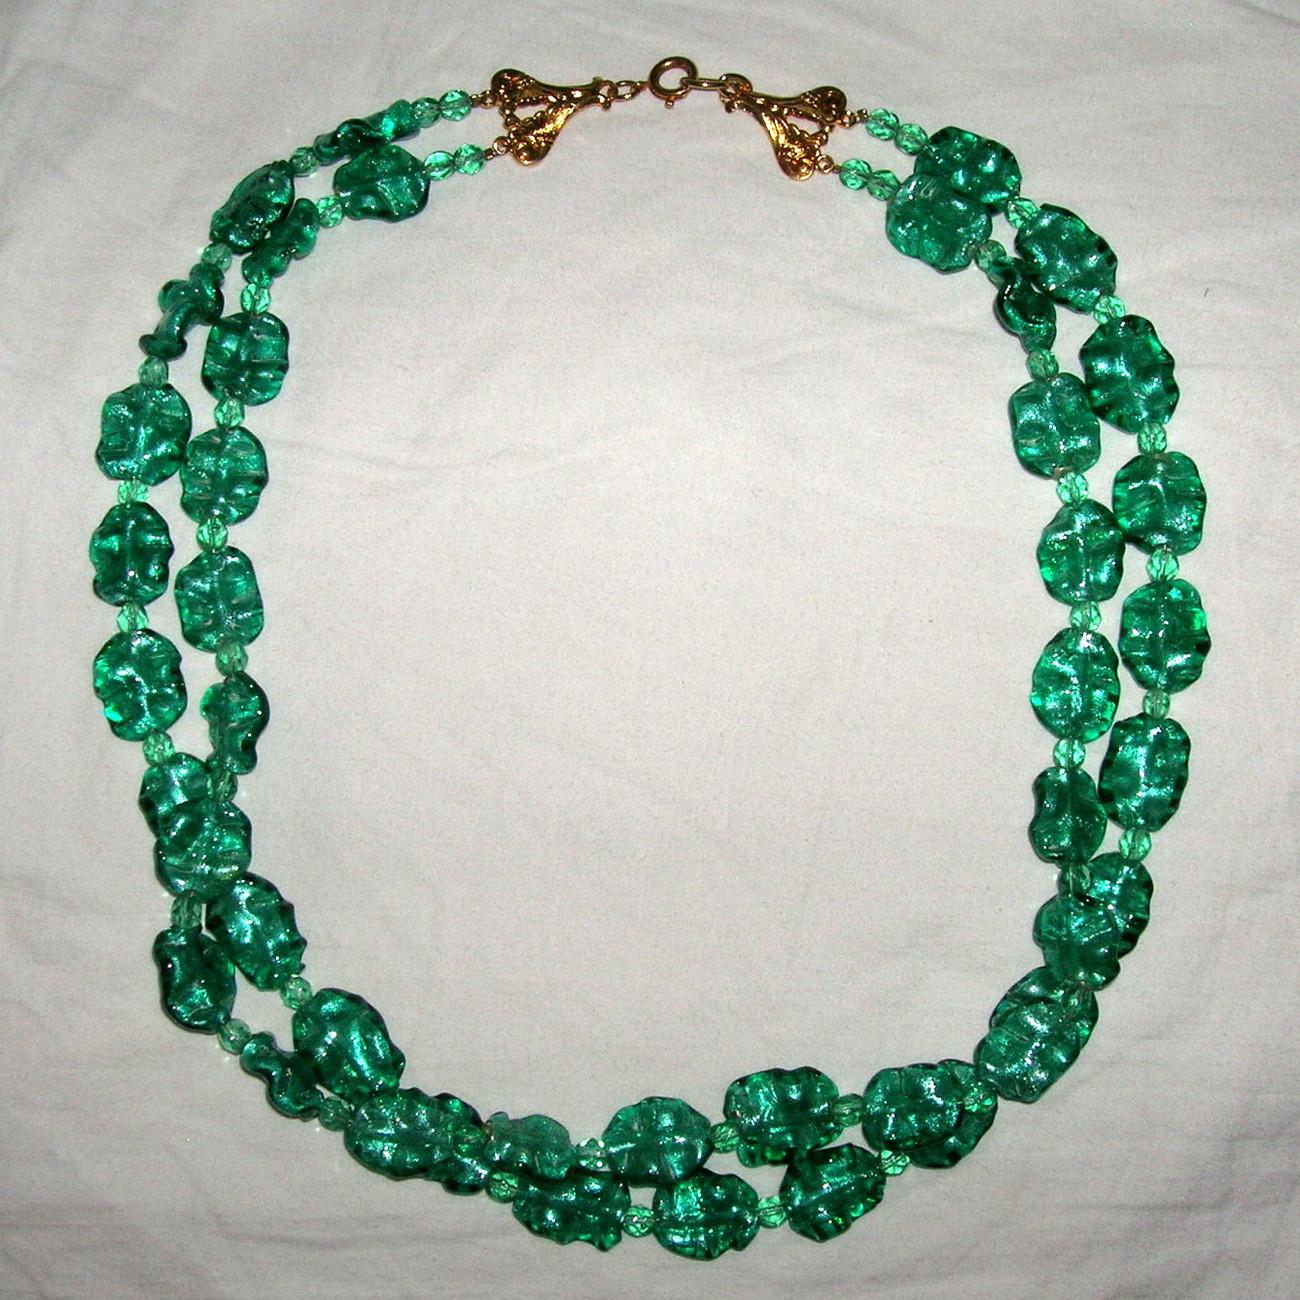 Vintage 2 Strand Venetian Silver Foil Aventurine Art Glass Ruffled Bead Necklace